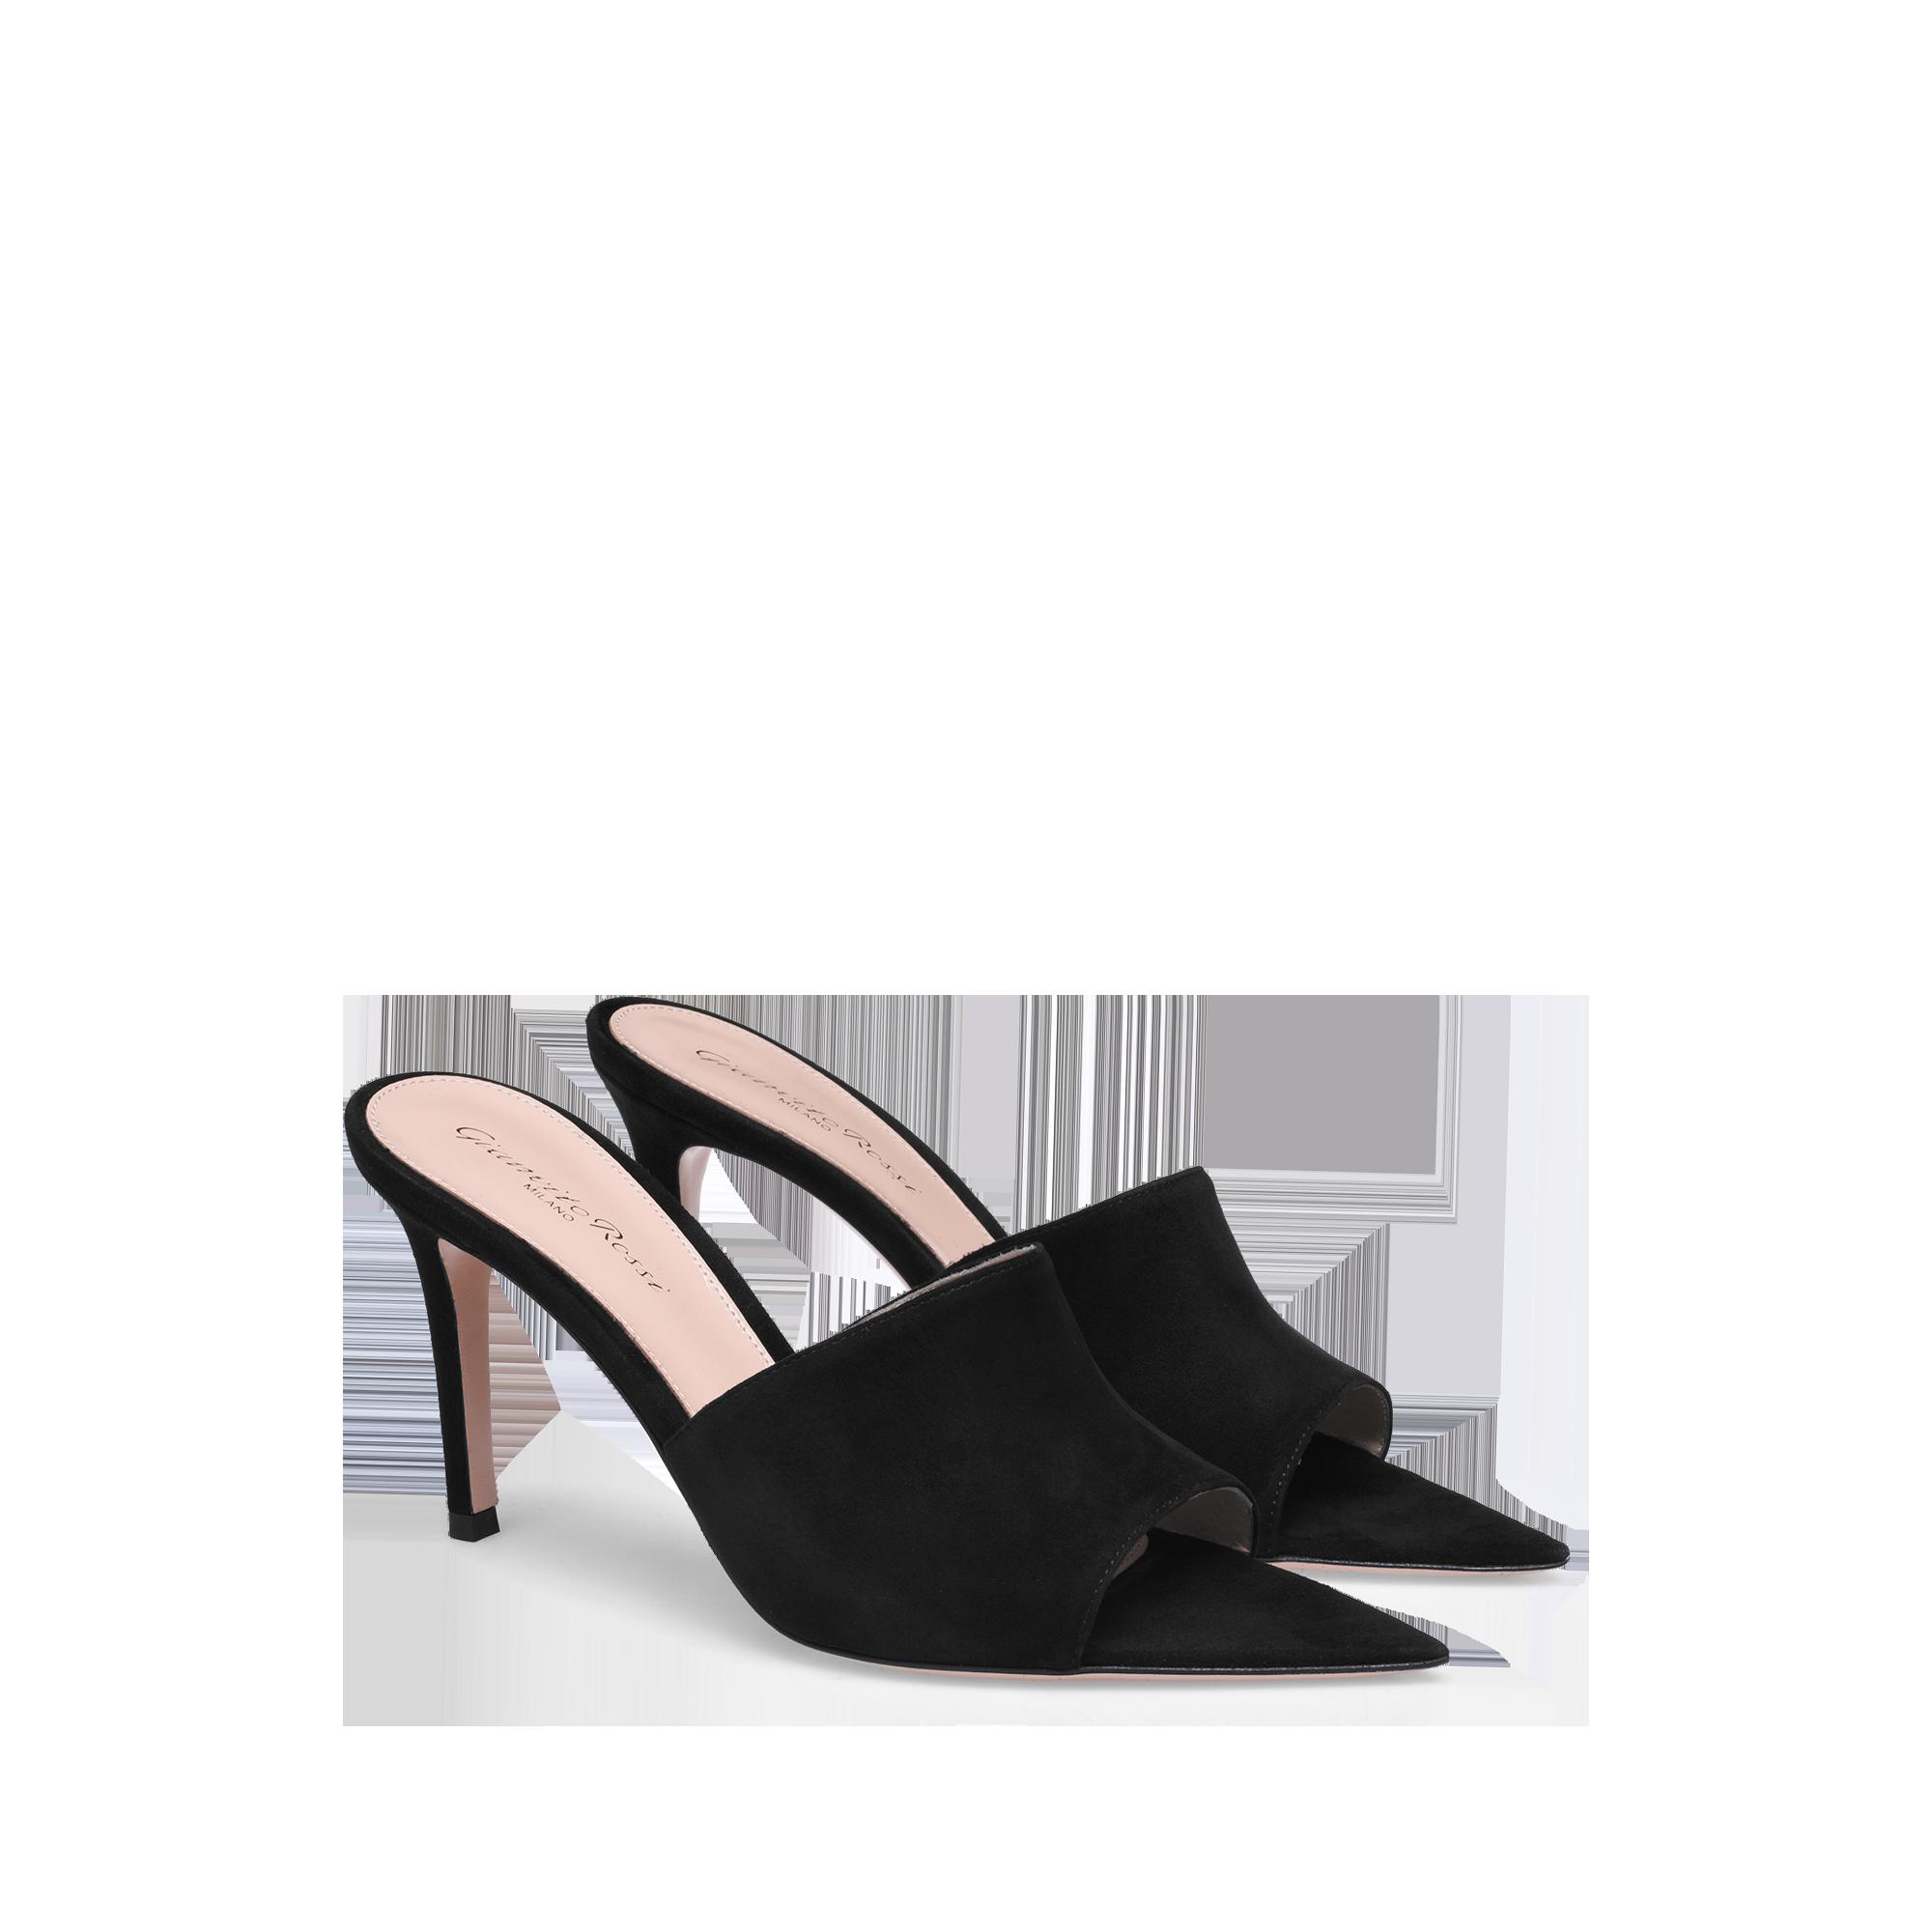 56cc1cb38c922 Kate Spade Mazie Sandals, Black/Cream - Size 9.5 | Products | Sandals, Shoe  boots, Kate spade